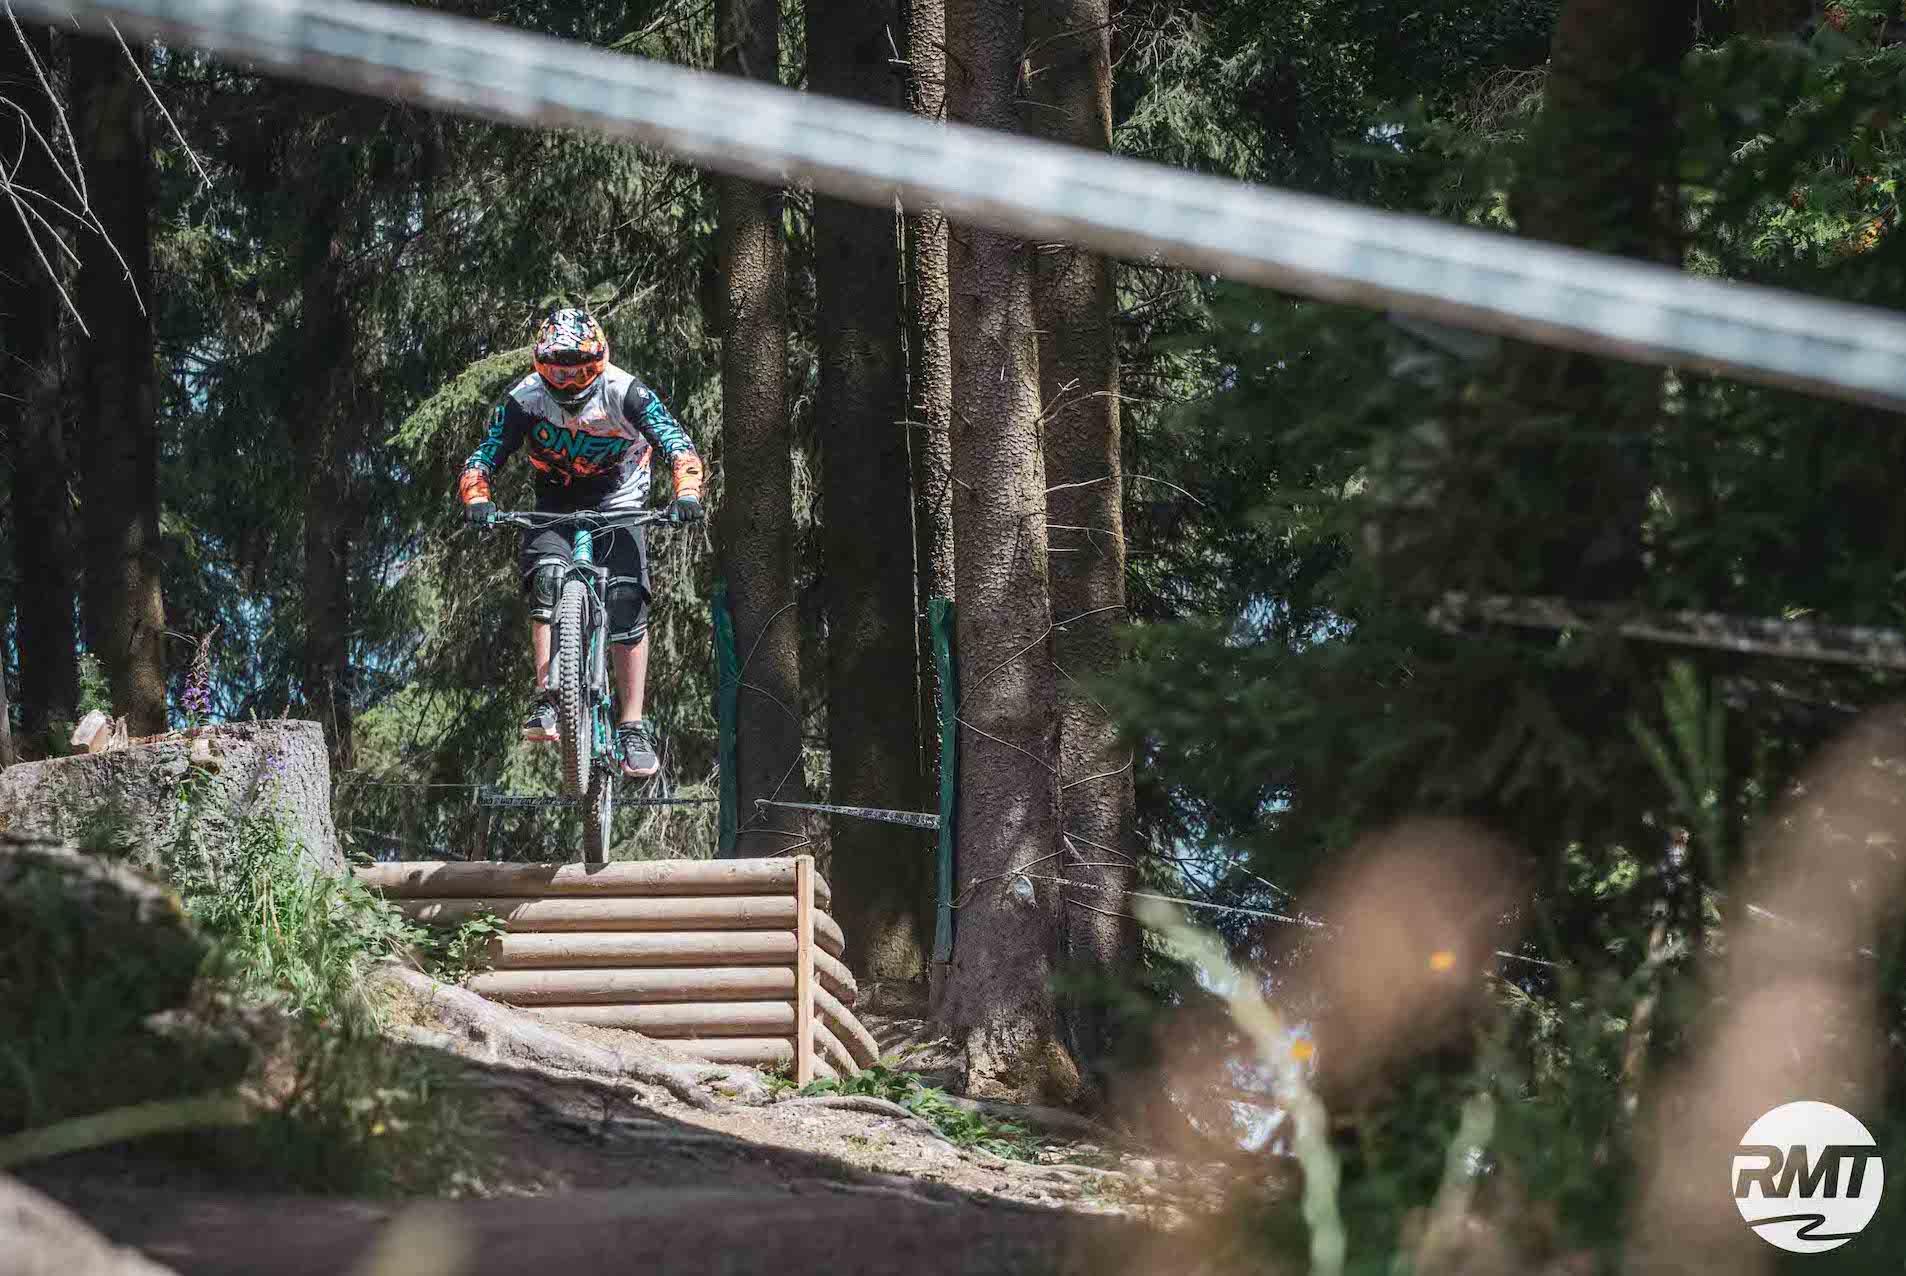 MTB Fahrtechnik Kinder Fortgeschritten Kurs im Bikepark Winterberg Training Rock my Trail Bikeschule 1